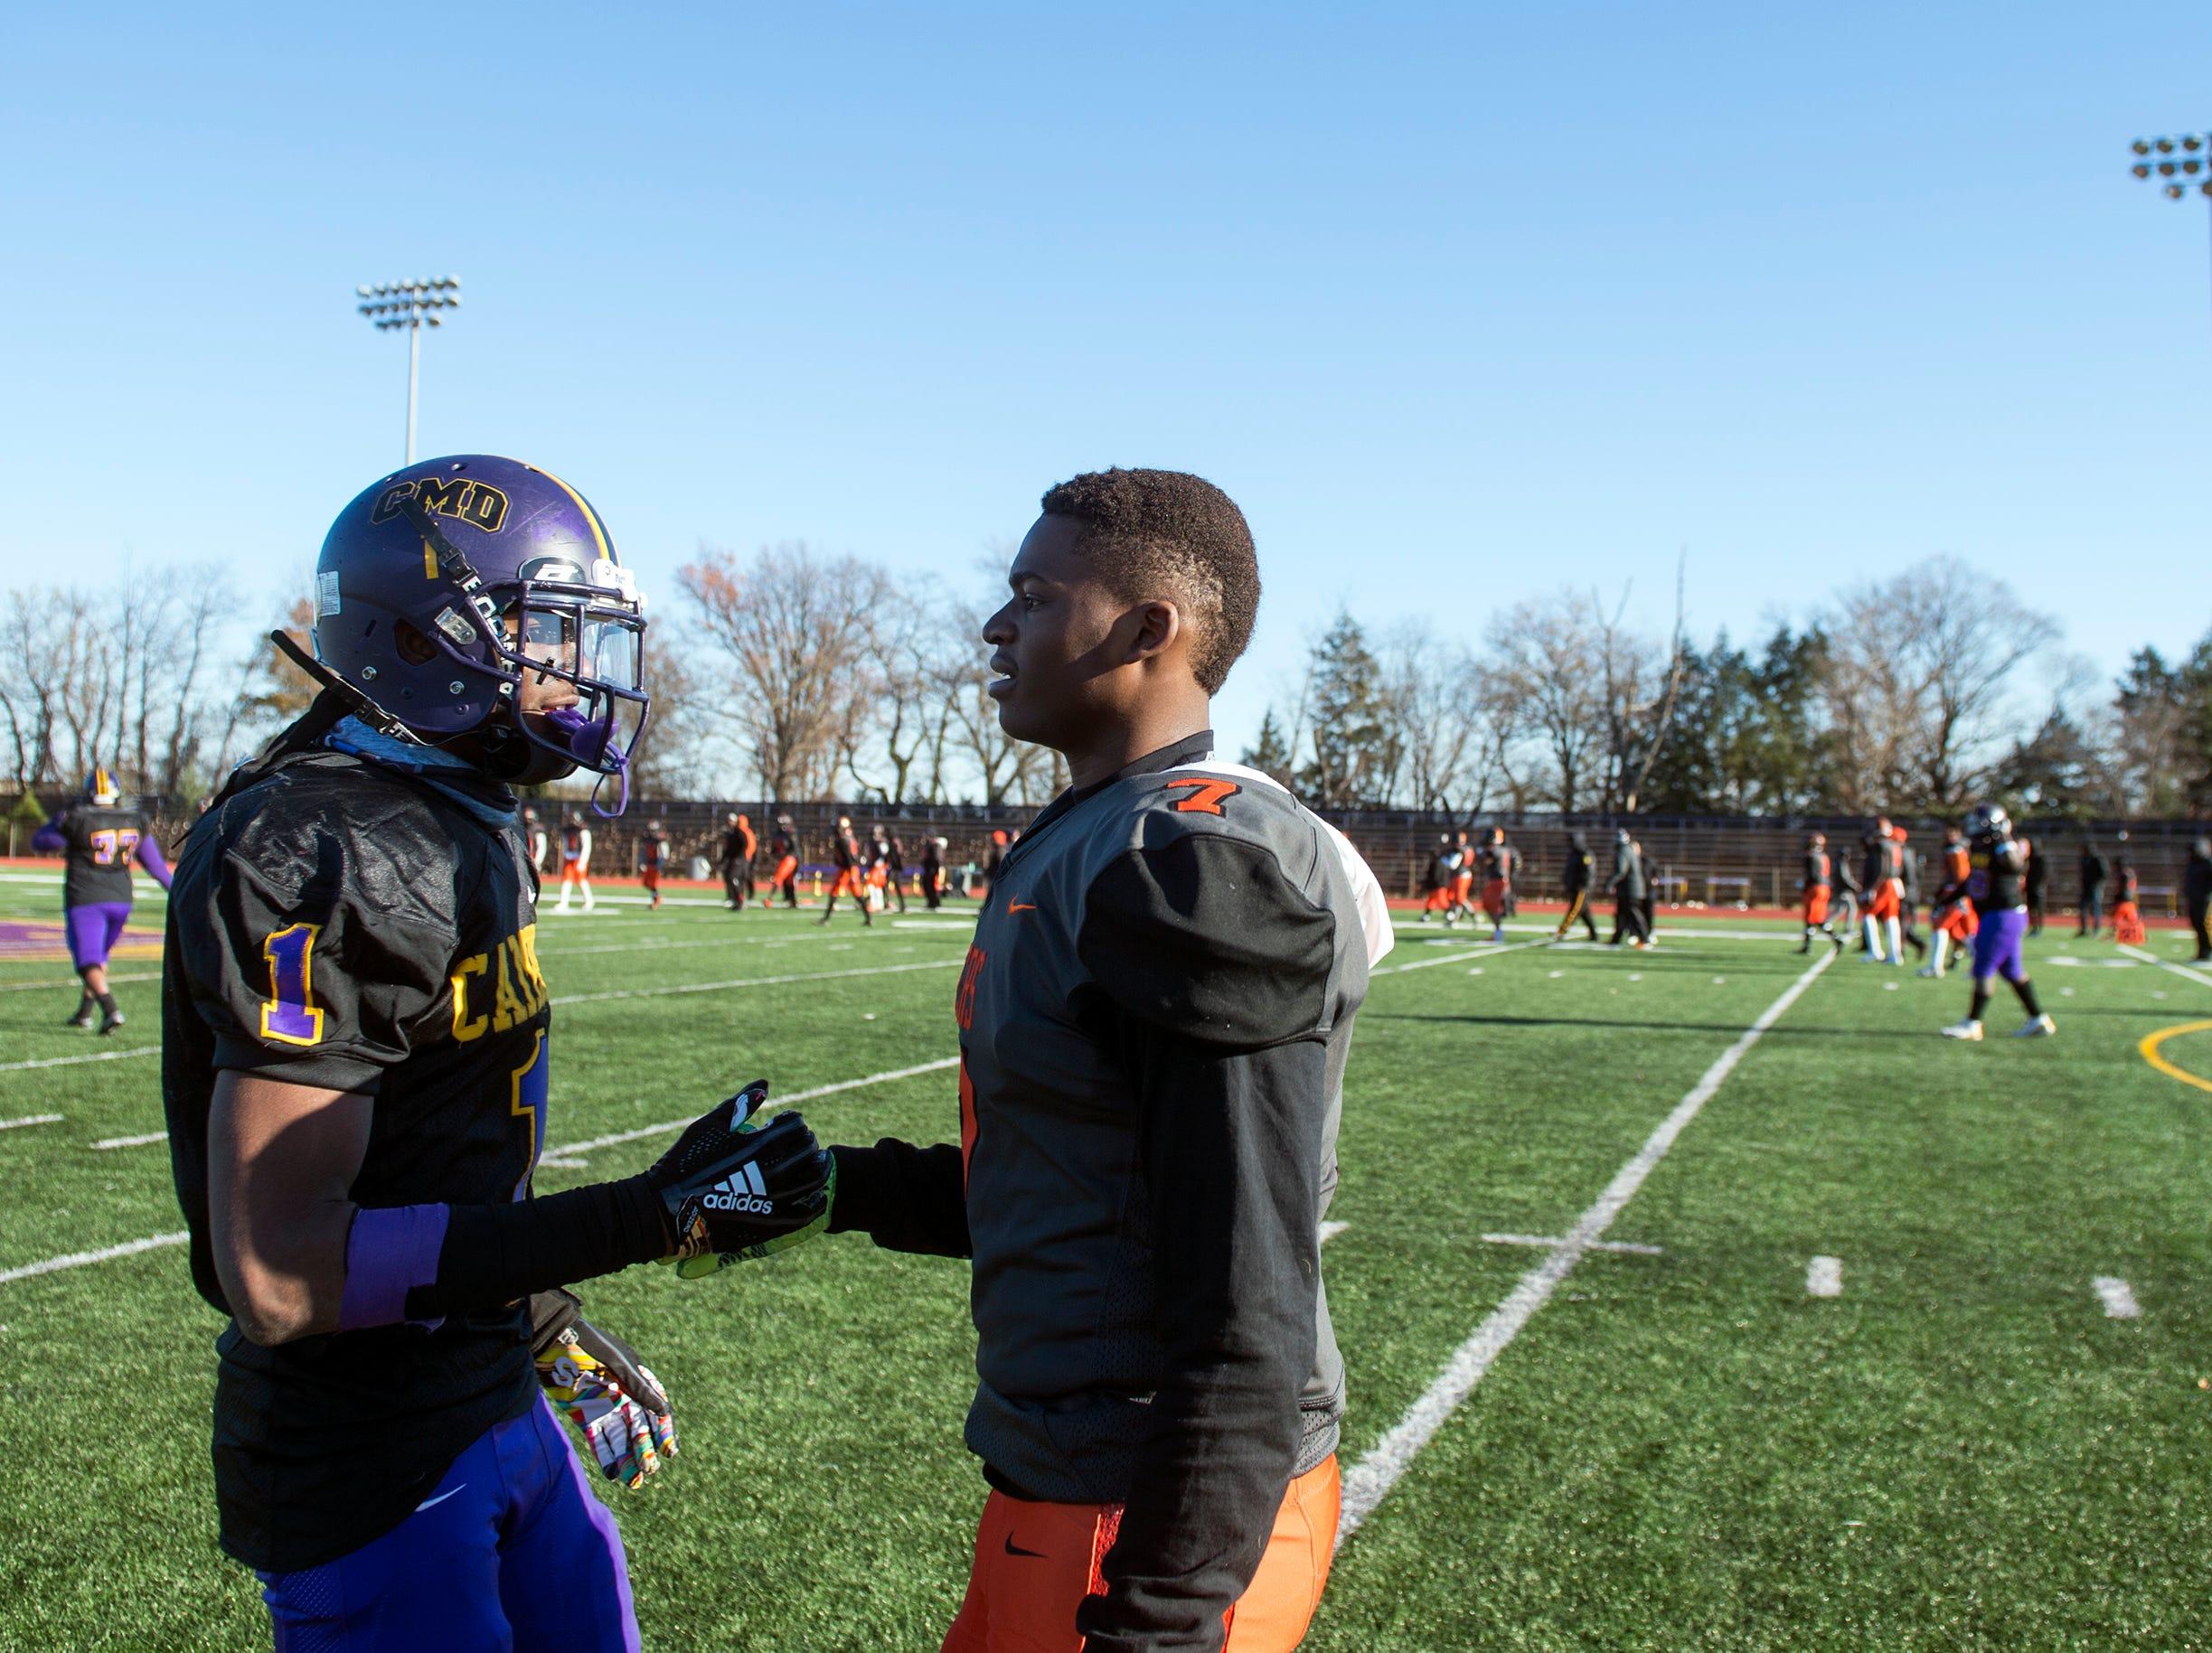 Camden's Corey Palmer (1) and Woodrow Wilson's Malik Harvey (7) shake hands following an annual Camden-Woodrow Wilson Thanksgiving game Thursday, Nov. 22, 2018 in Camden, N.J. Camden won 39-28.